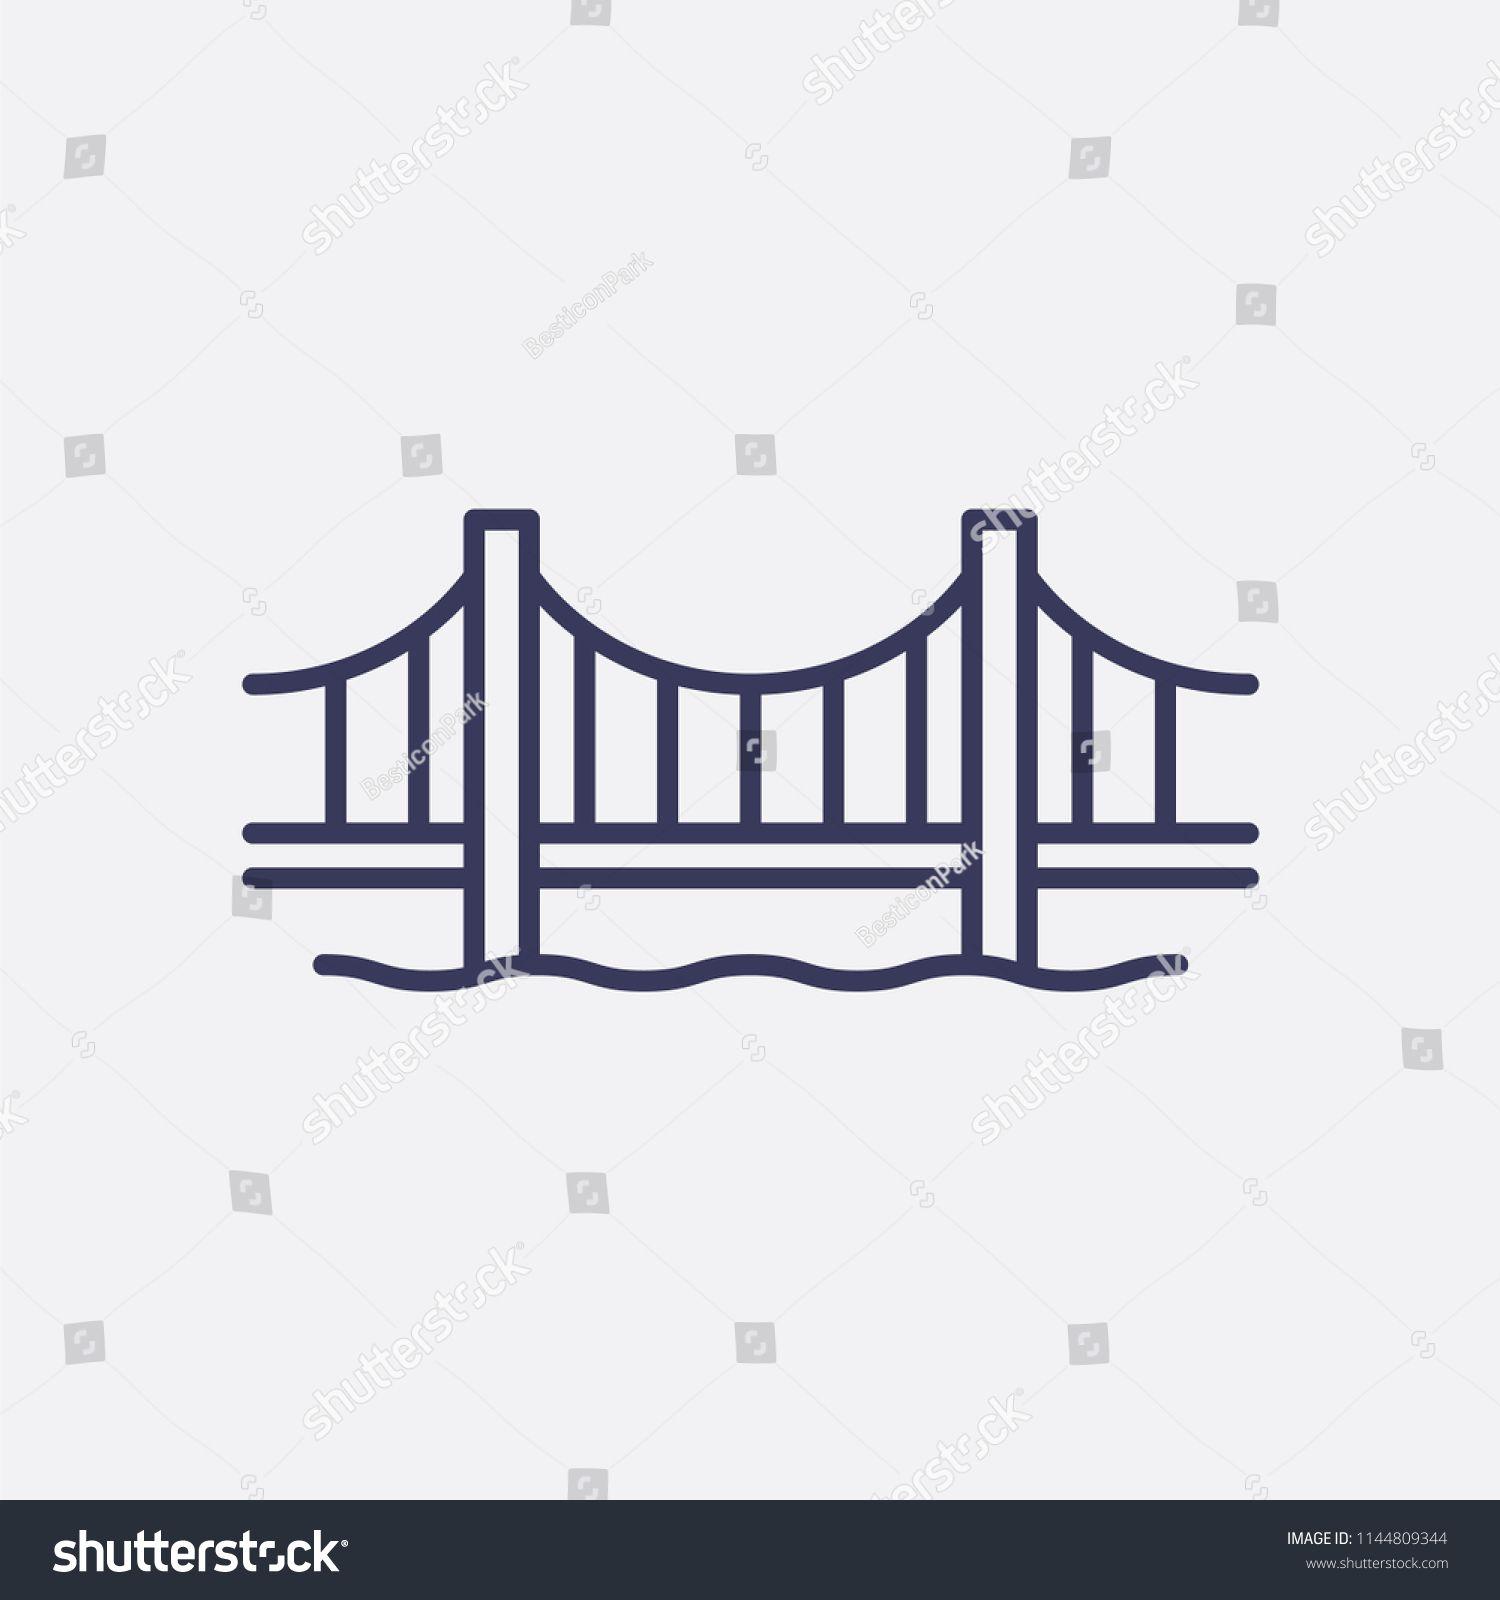 Outline Golden Gate Bridge Icon Illustration Vector America Sign Symbol Sponsored Sponsored Bridge Icon Gate Outline Bridge Icon Hand Drawn Icons Outline